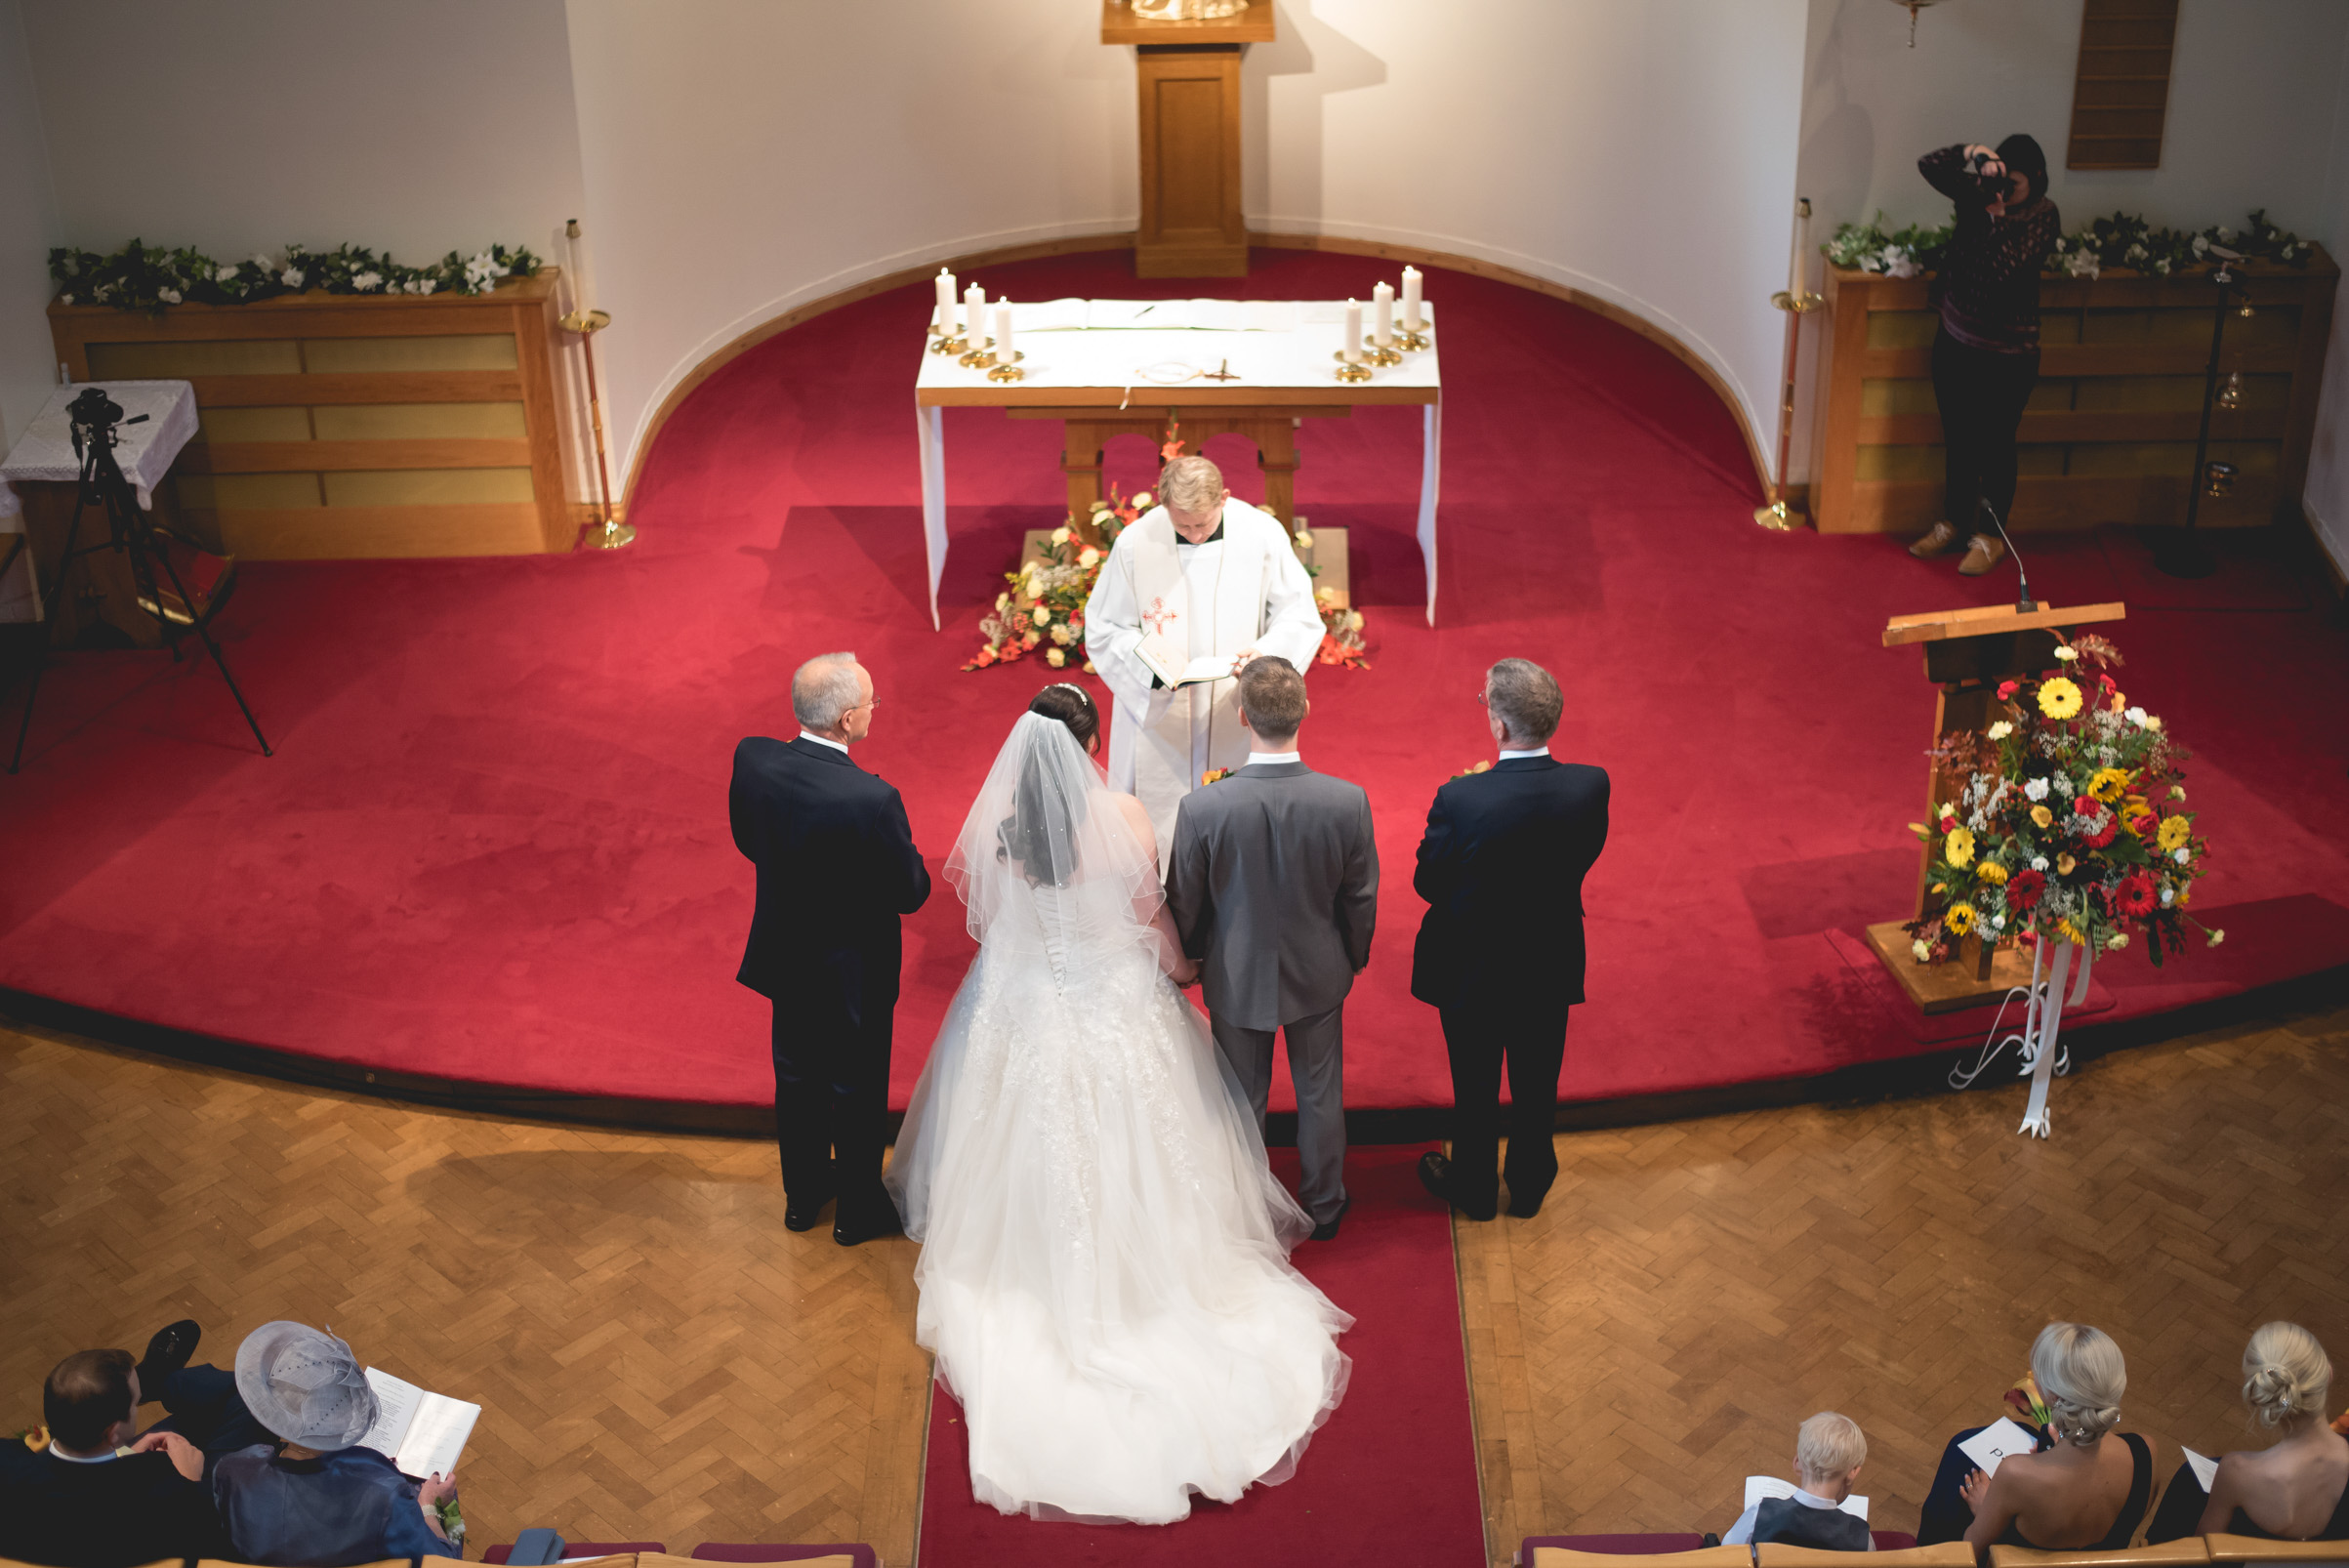 The+Fairlawns+wedding+Aldridge+StLukes+Church-87.jpg